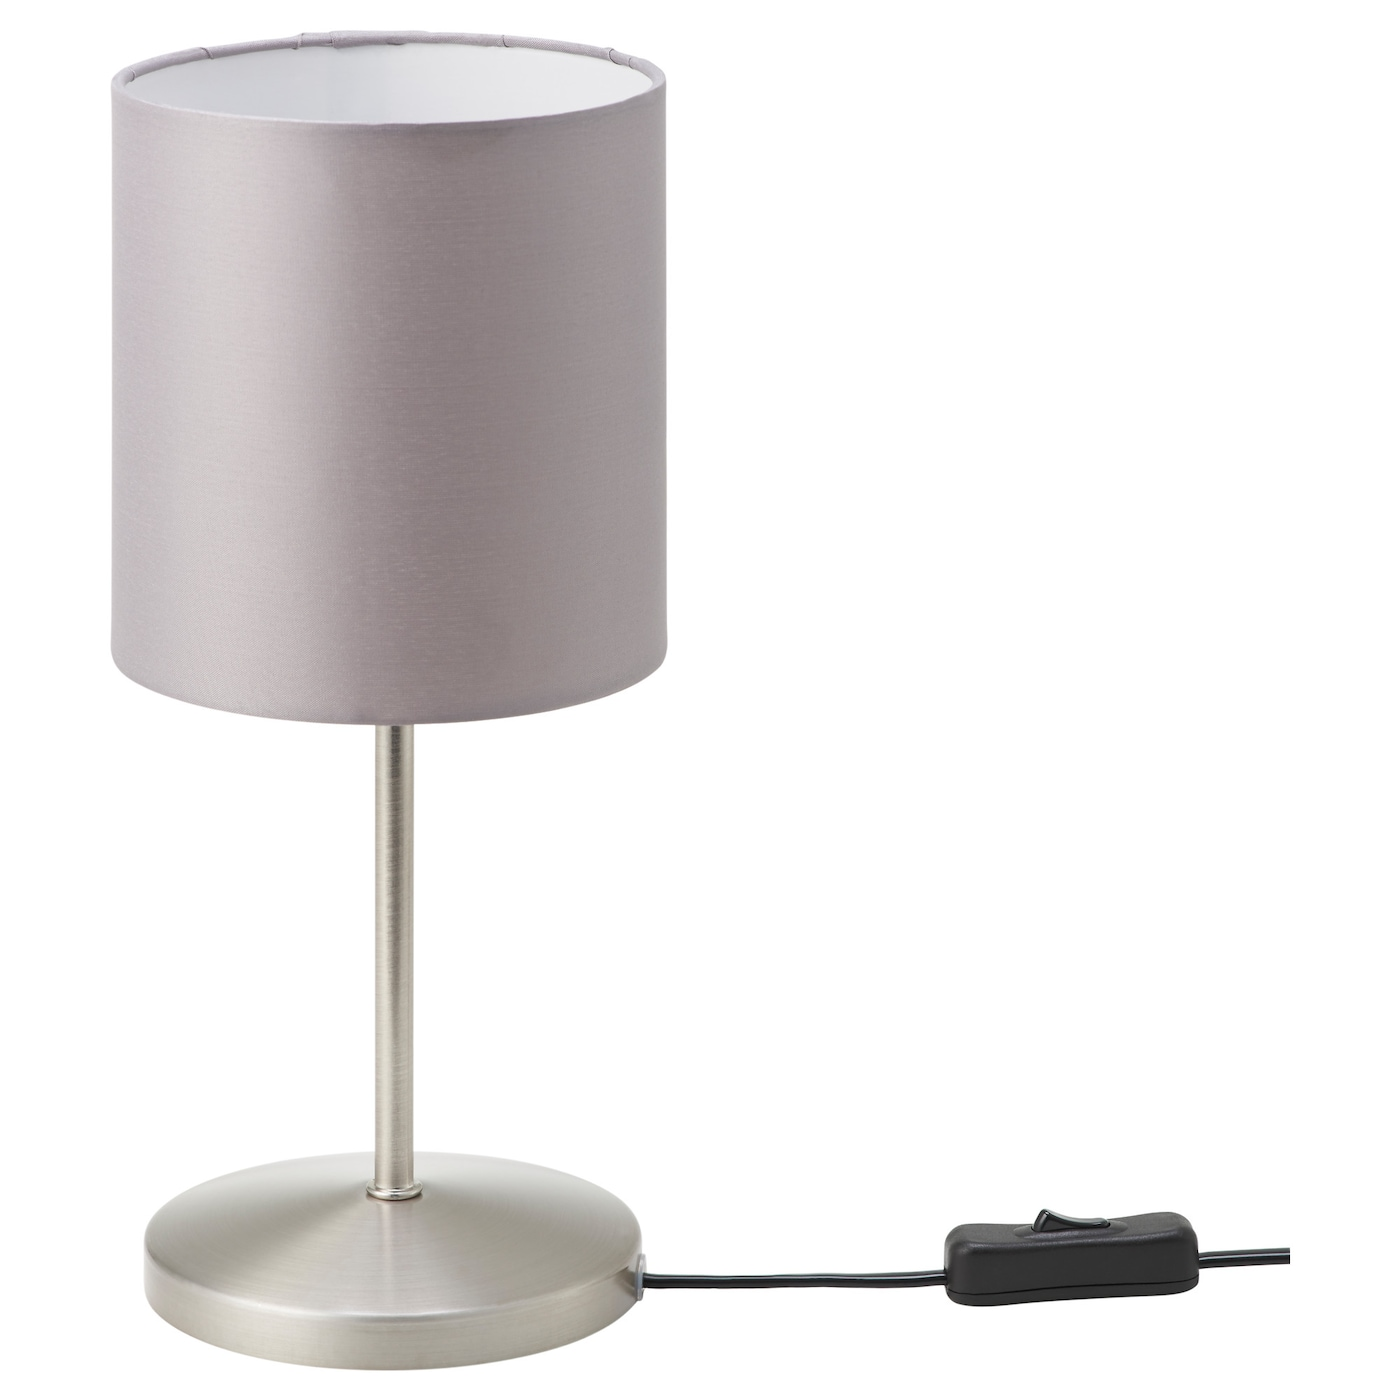 lampe de table lampe de table led ikea. Black Bedroom Furniture Sets. Home Design Ideas